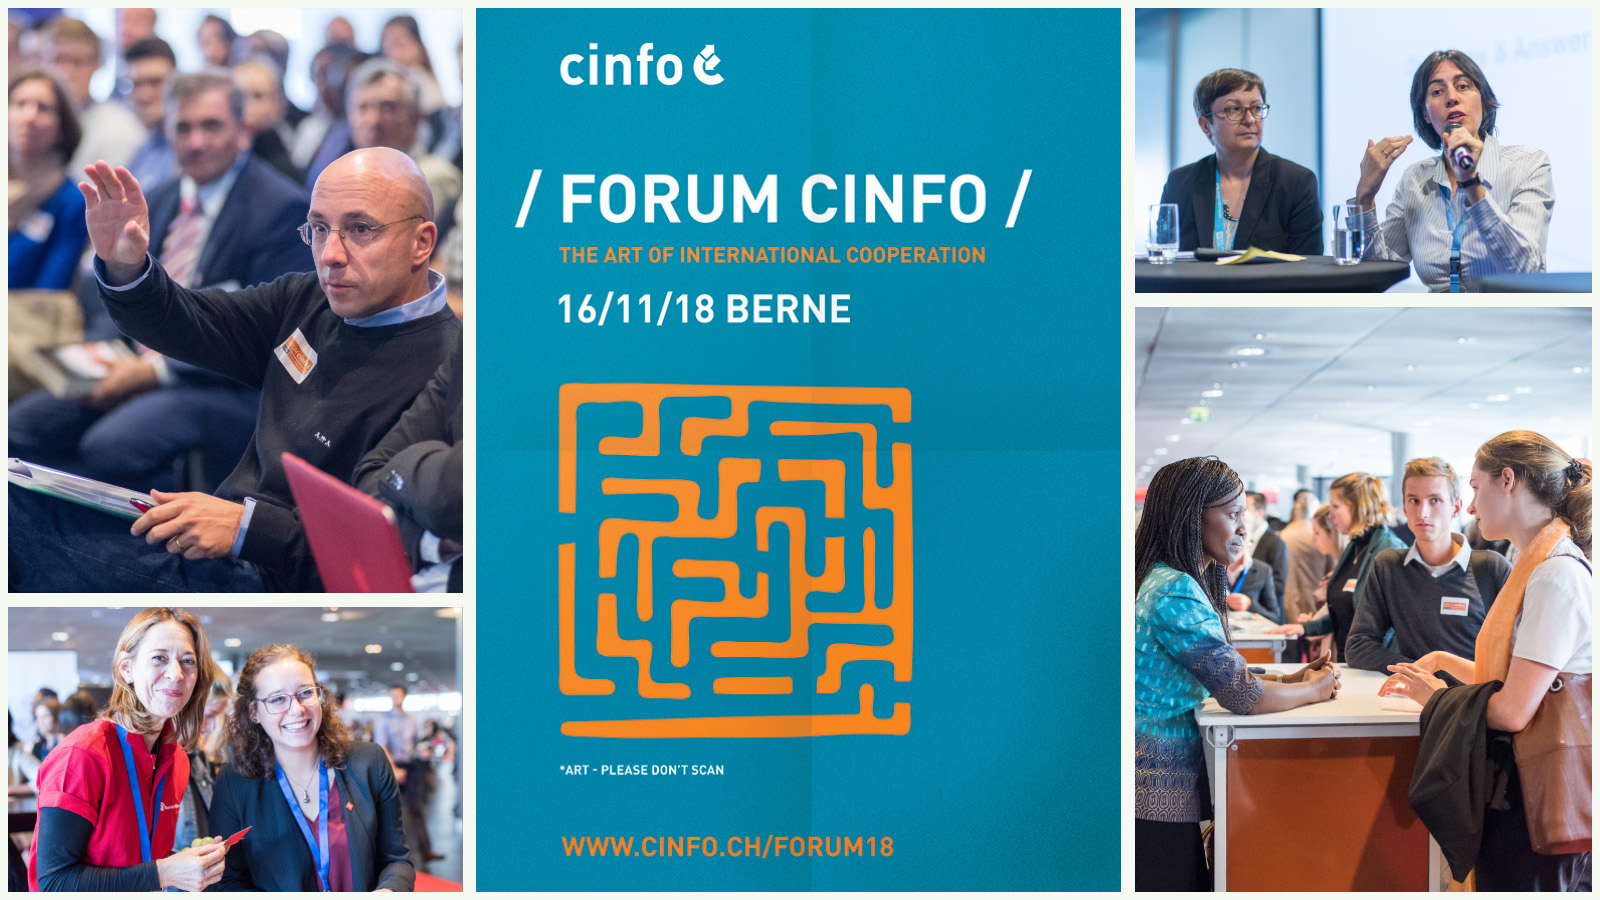 Stand d'info au Forum Cinfo